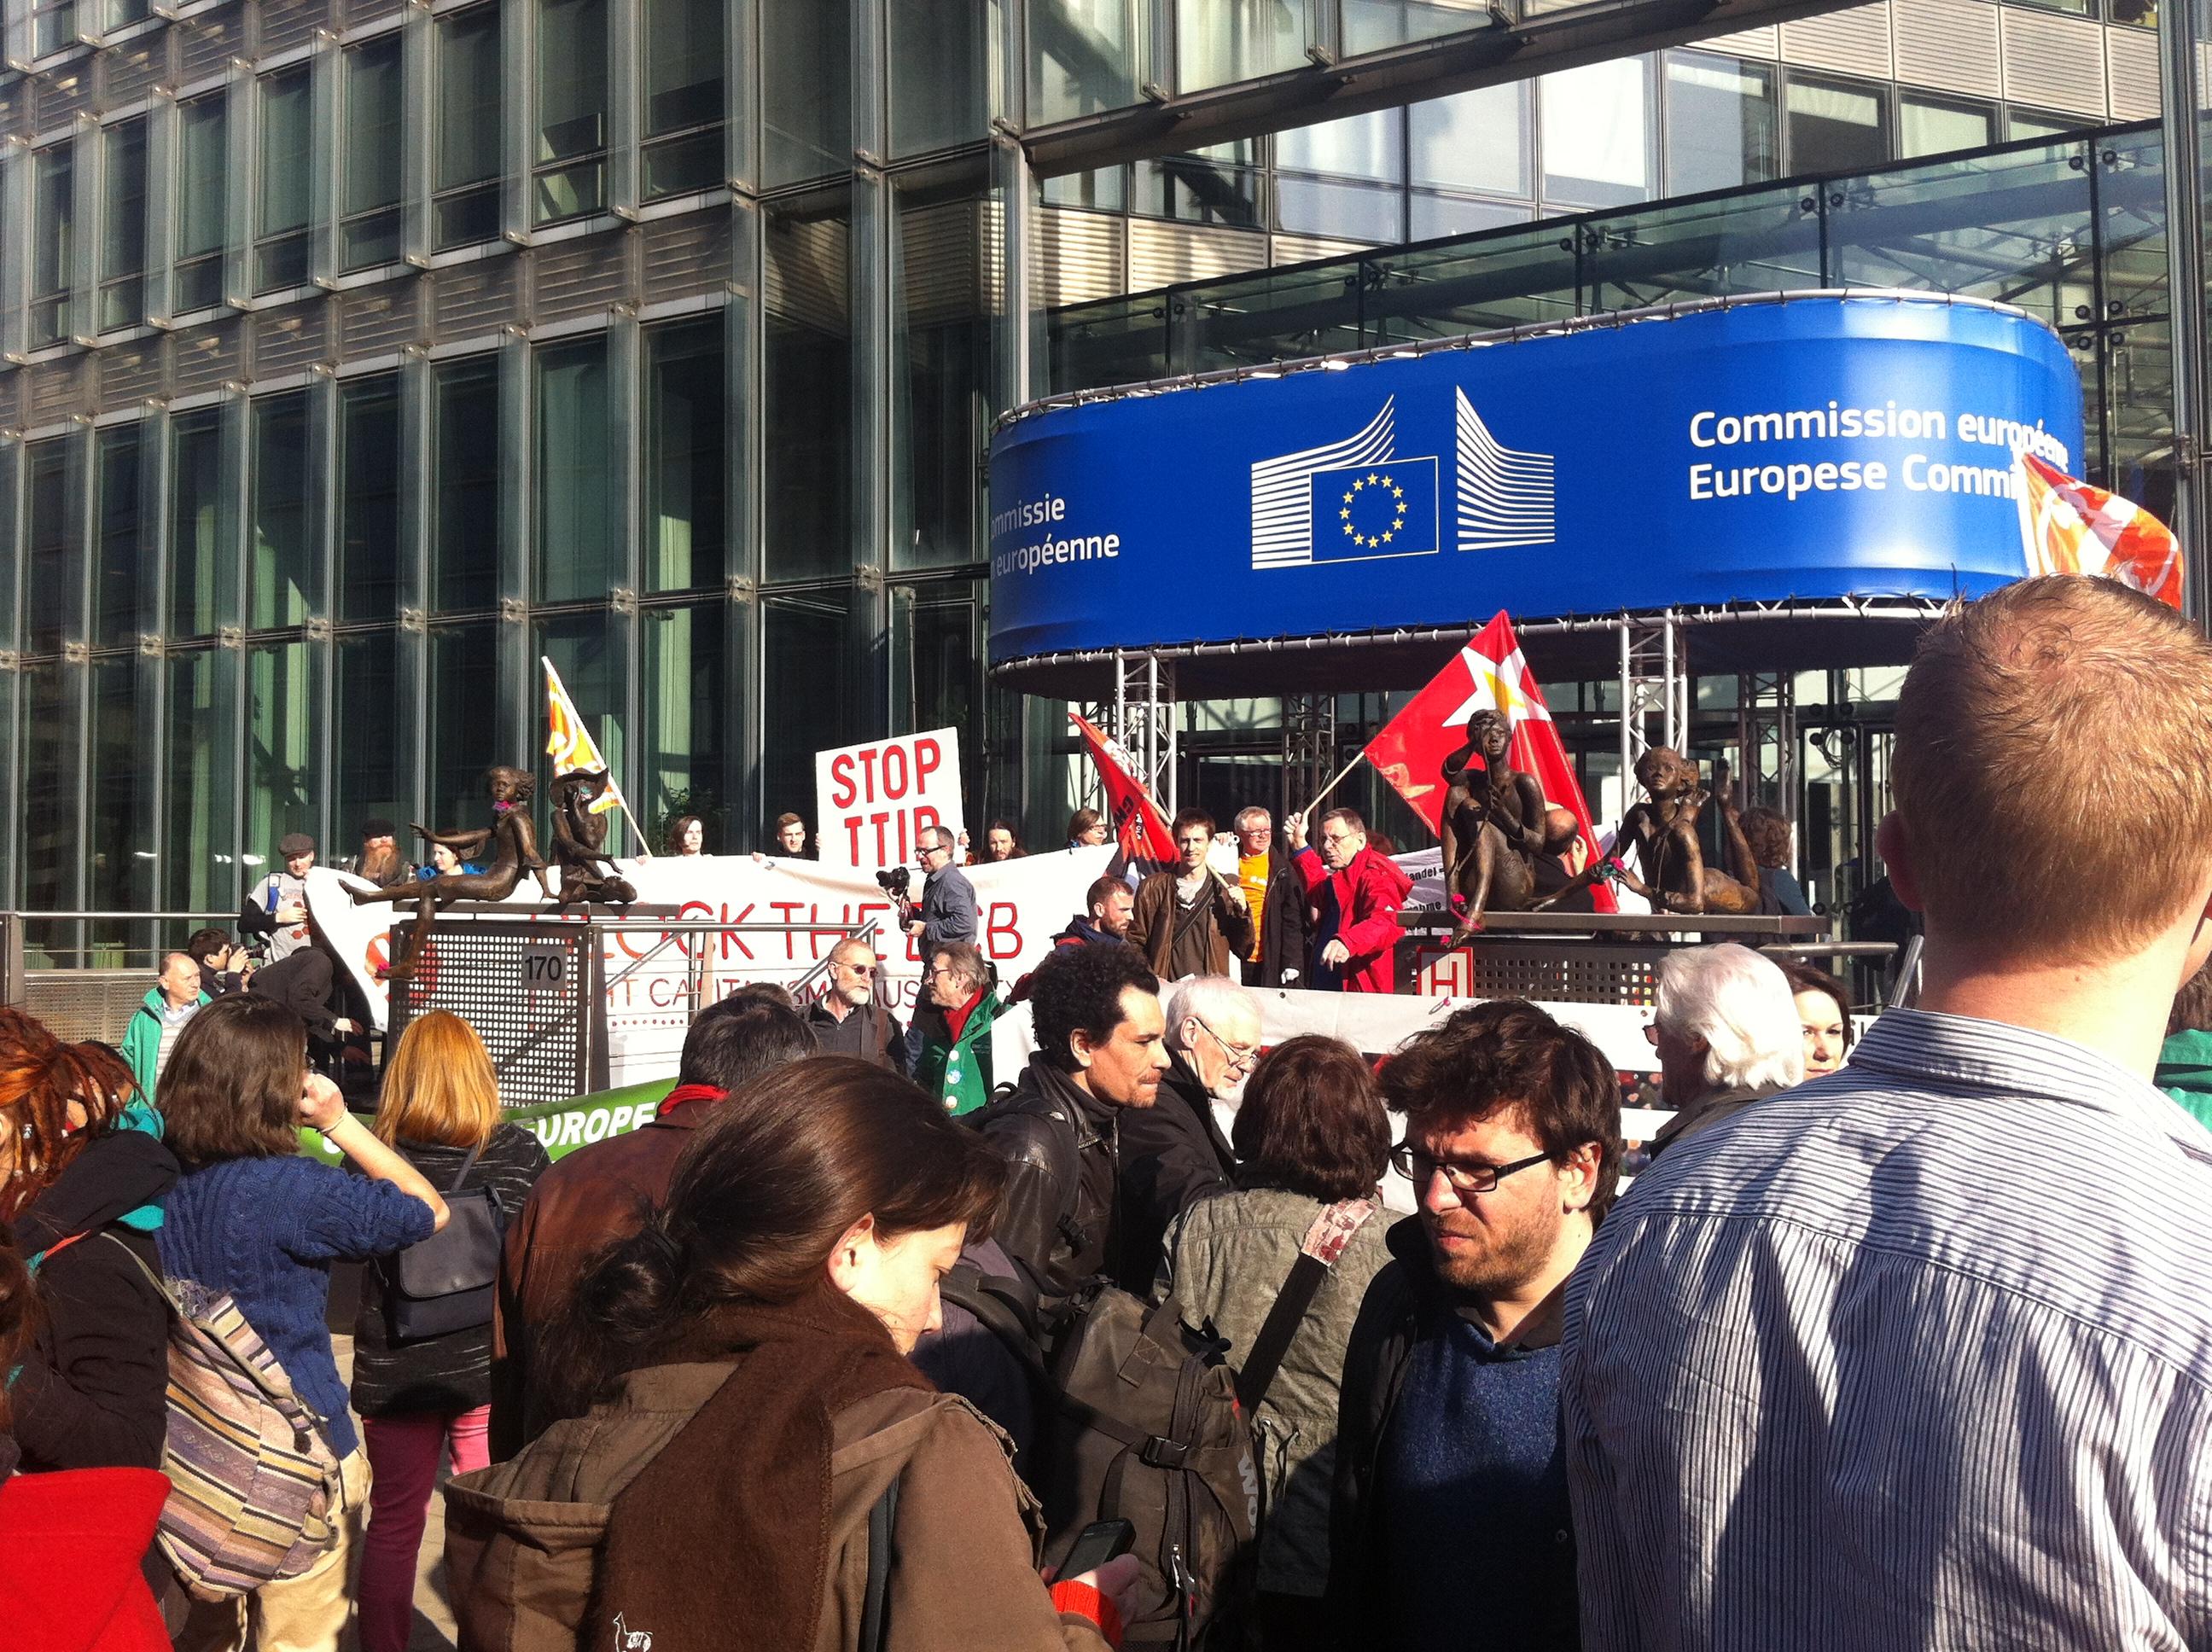 Protestaktion am 13.3.14 in Brüssel. Foto: Maritta Strasser/Campact